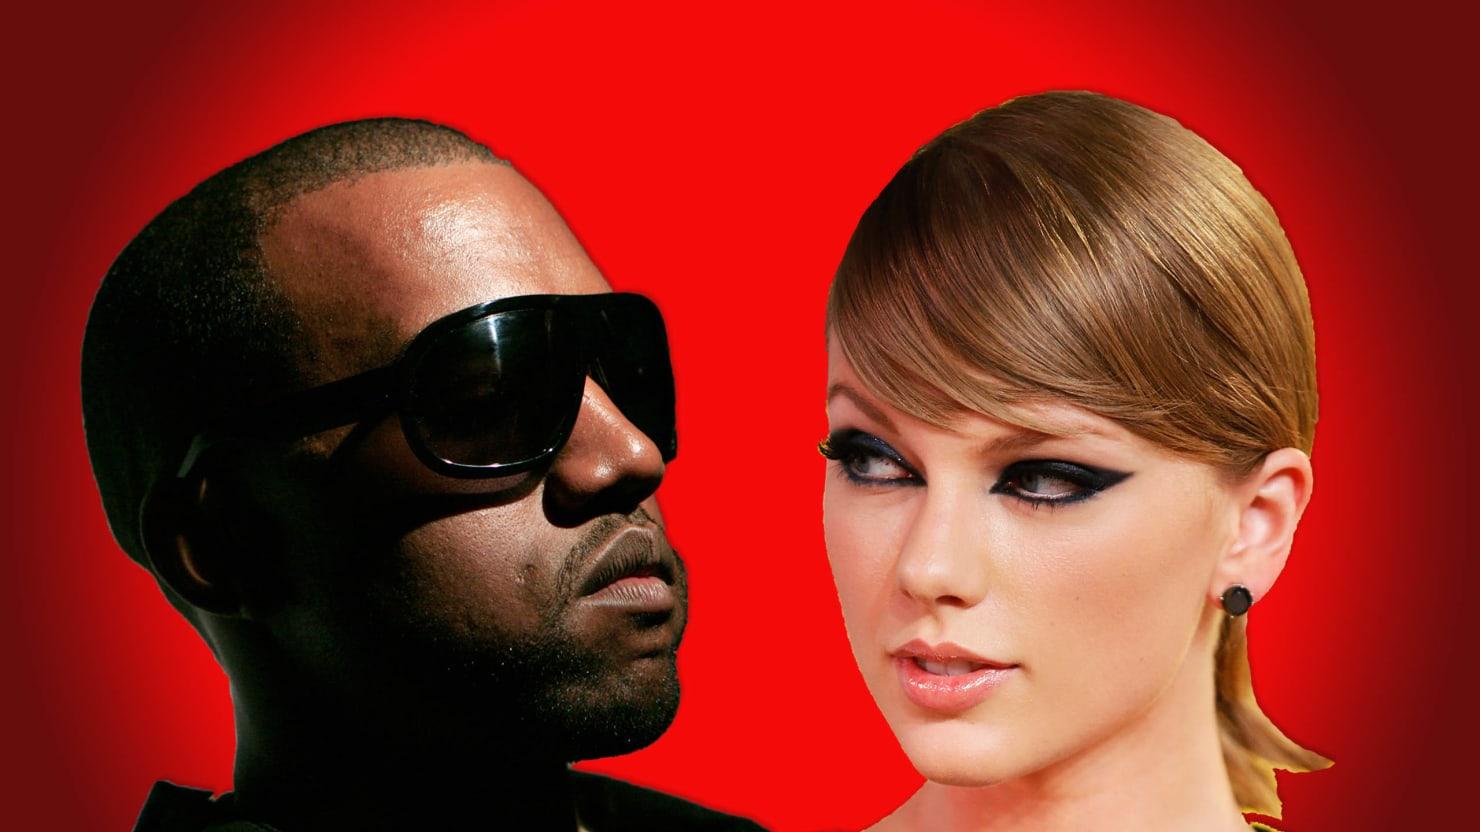 Kim Kardashian Exposes Taylor Swift on Snapchat, Swift Calls It 'Character Assassination'